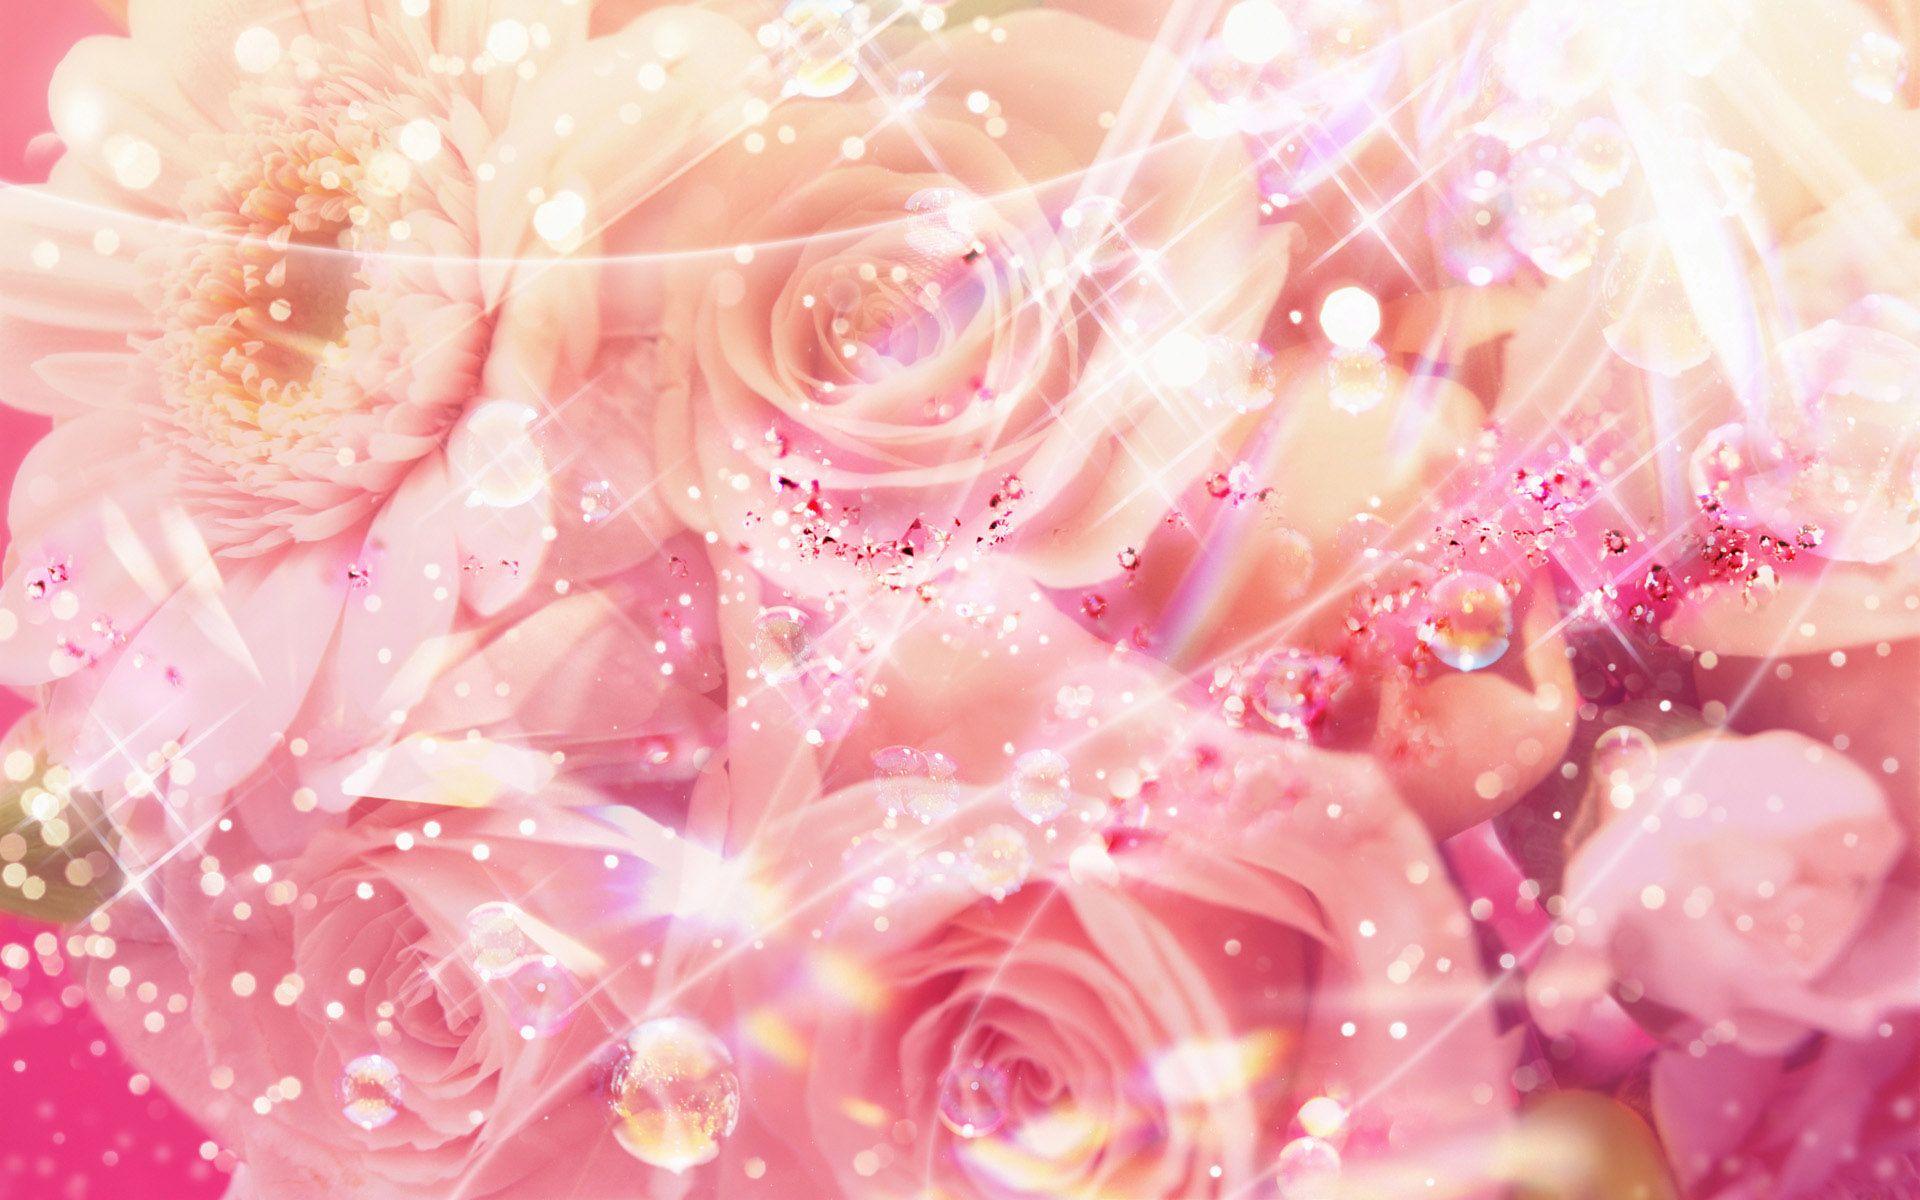 Pinkflowersbling Pink Flowers Background Rose Wallpaper Flower Backgrounds Flower wallpaper for desktop full size